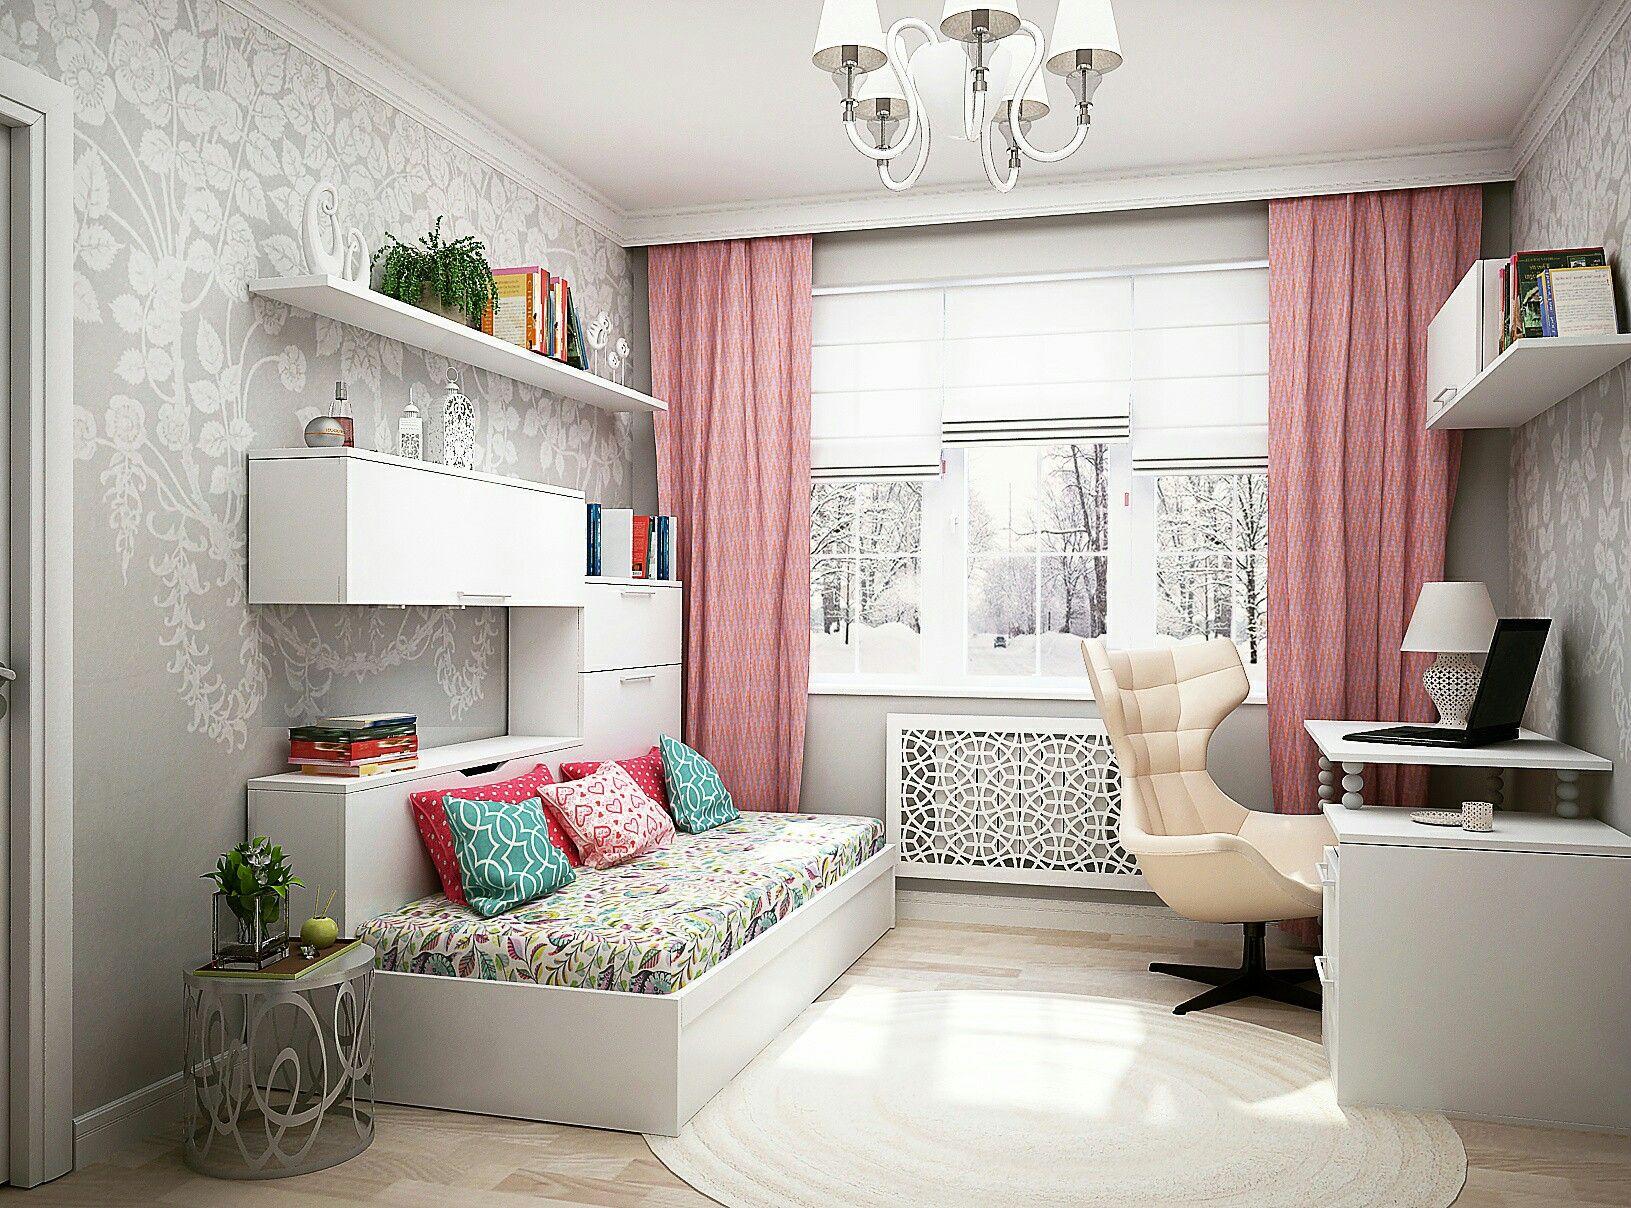 Продажа 1-комнаты в микрорайоне ММС